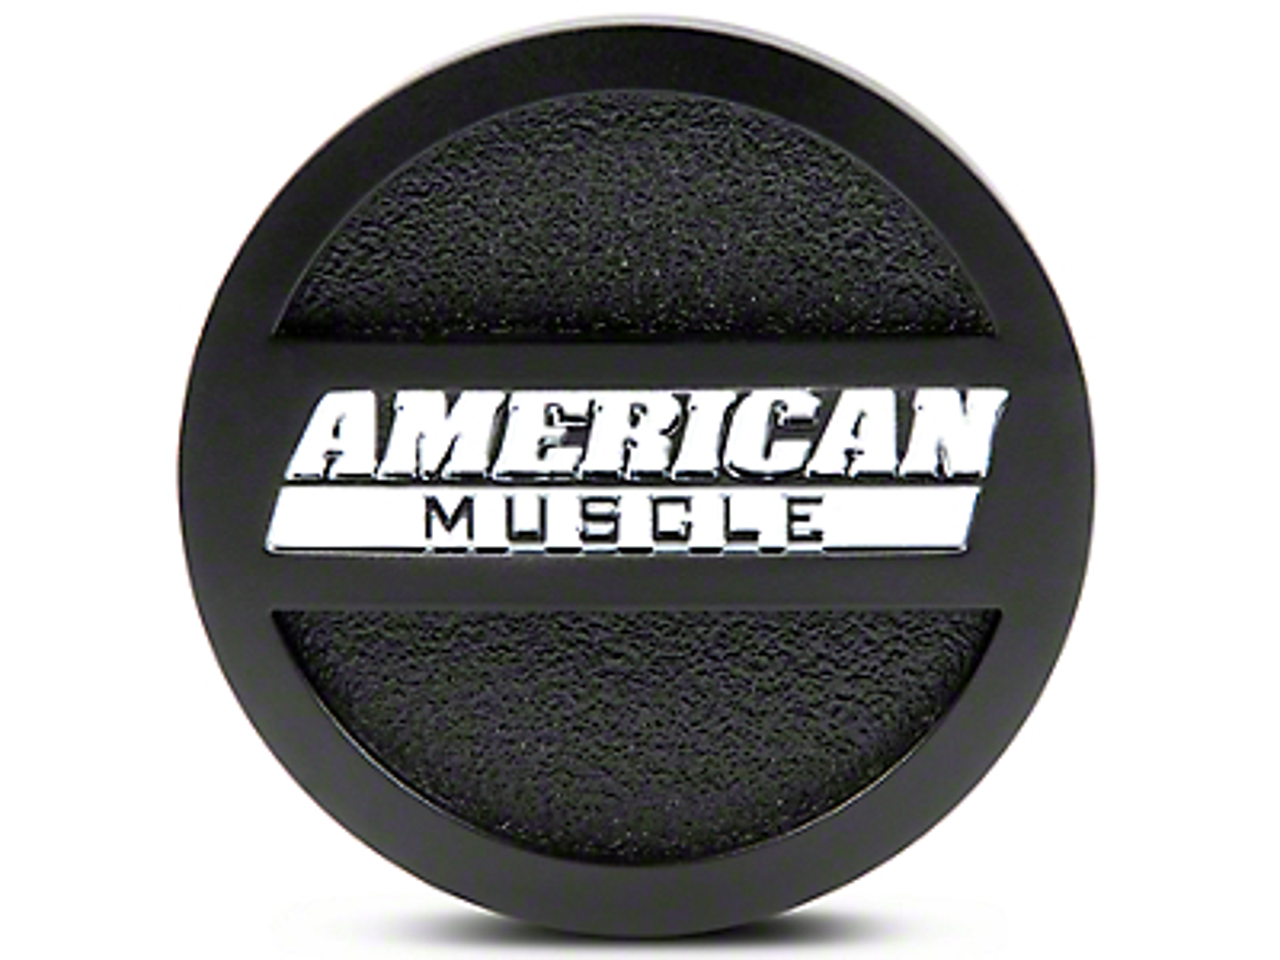 Matte Black AmericanMuscle Center Cap - Large